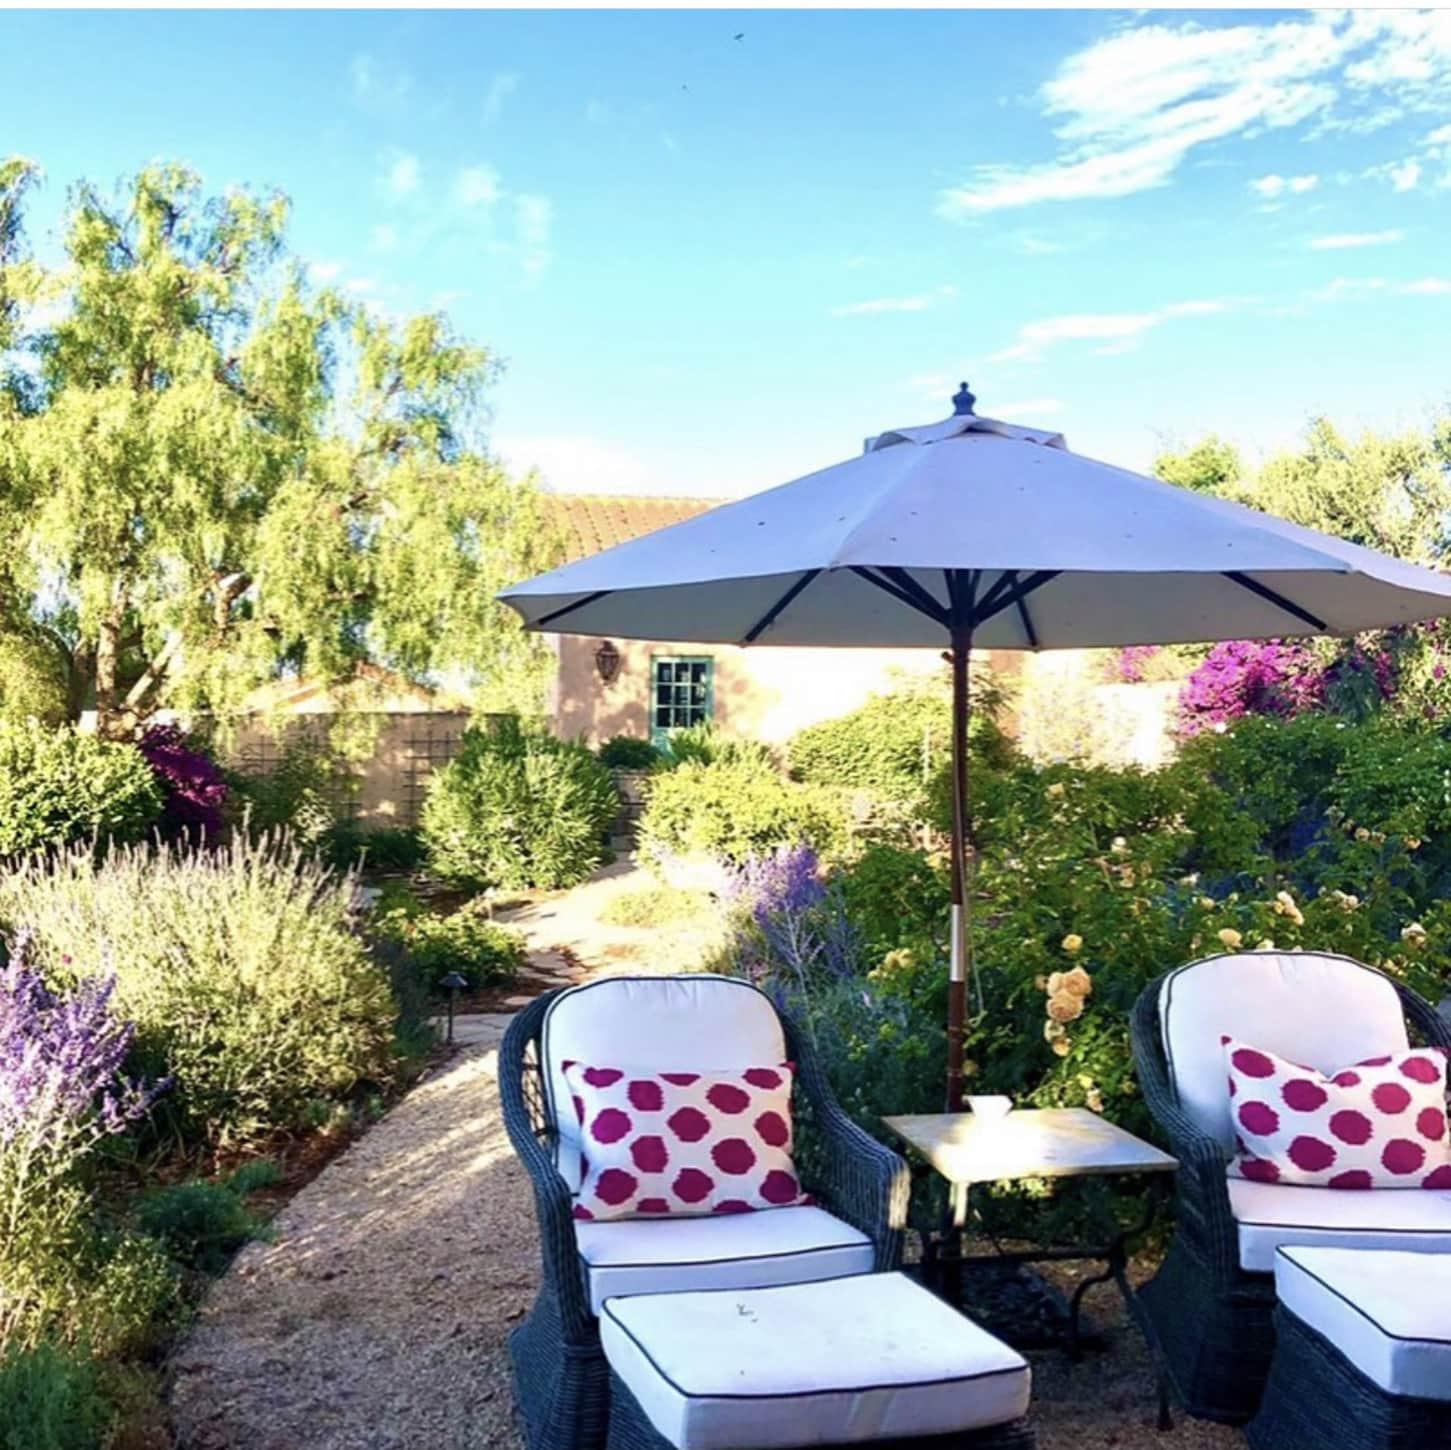 Designer Cindy Hattersley's Sitting Area in her Garden